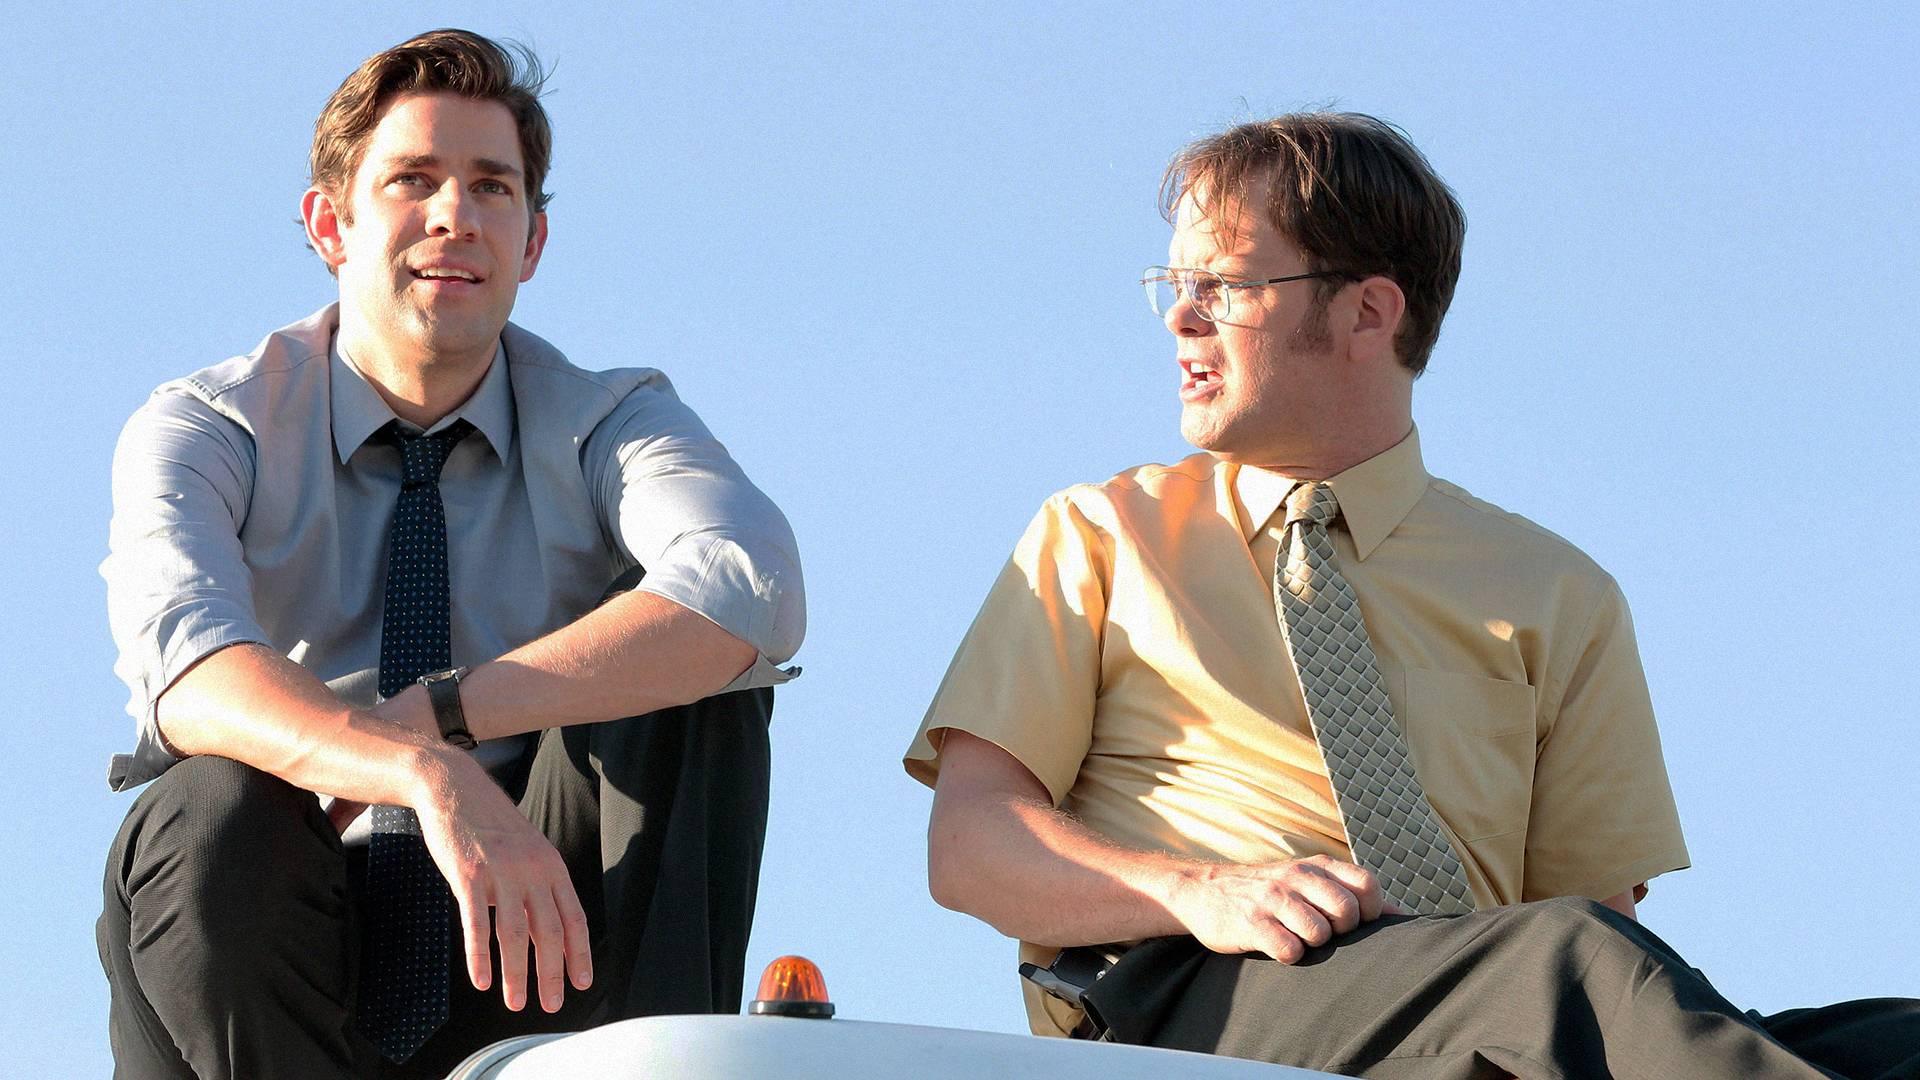 The Office Season 9 Episode 4